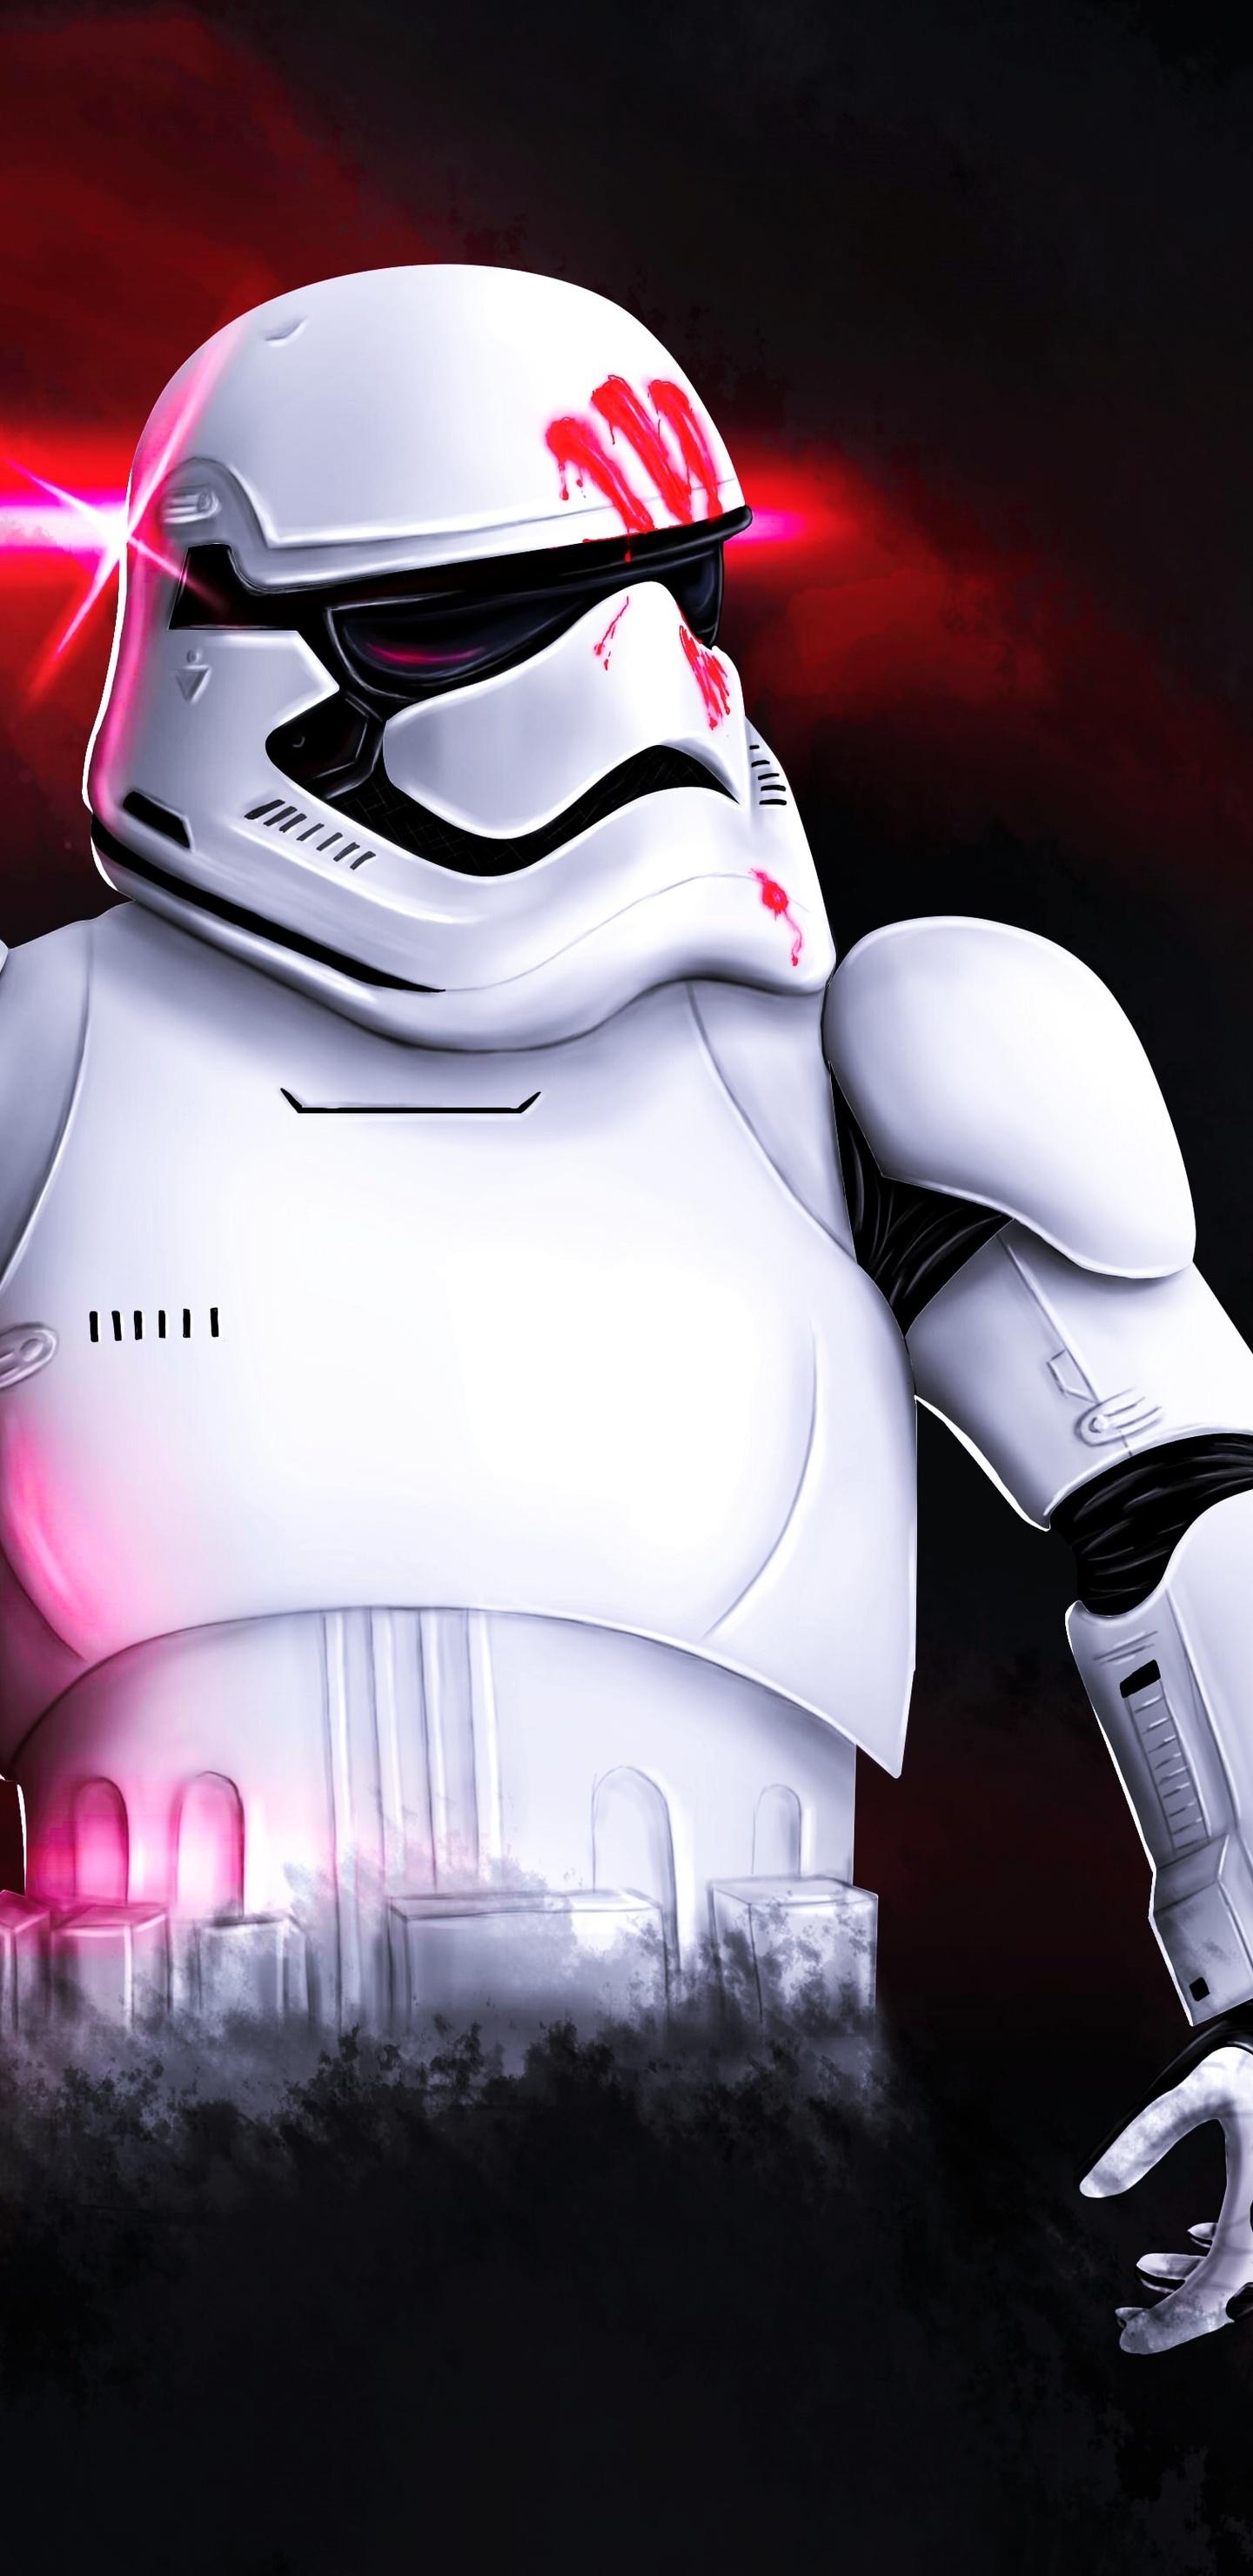 1440x2960 Clone Trooper Star Wars 4k Samsung Galaxy Note 9,8